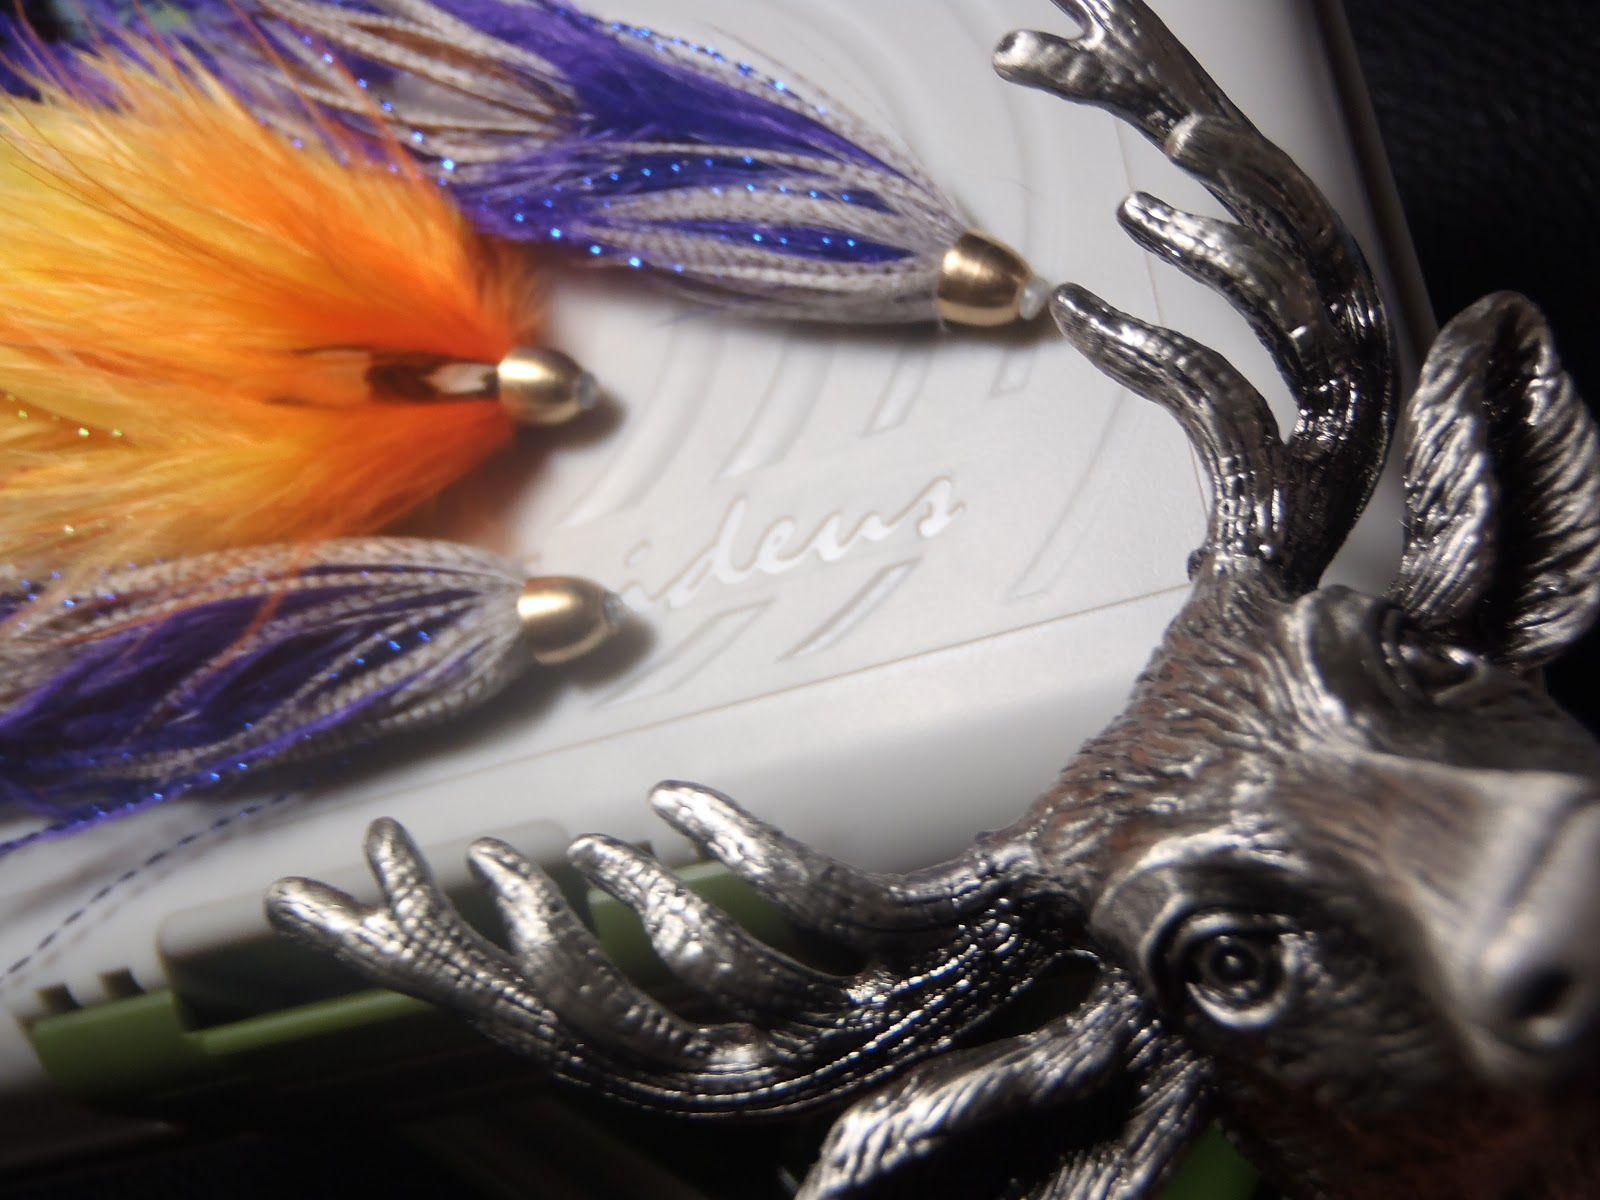 Irideus fly fishing products irideus steelhead fly for Steelhead fishing gear